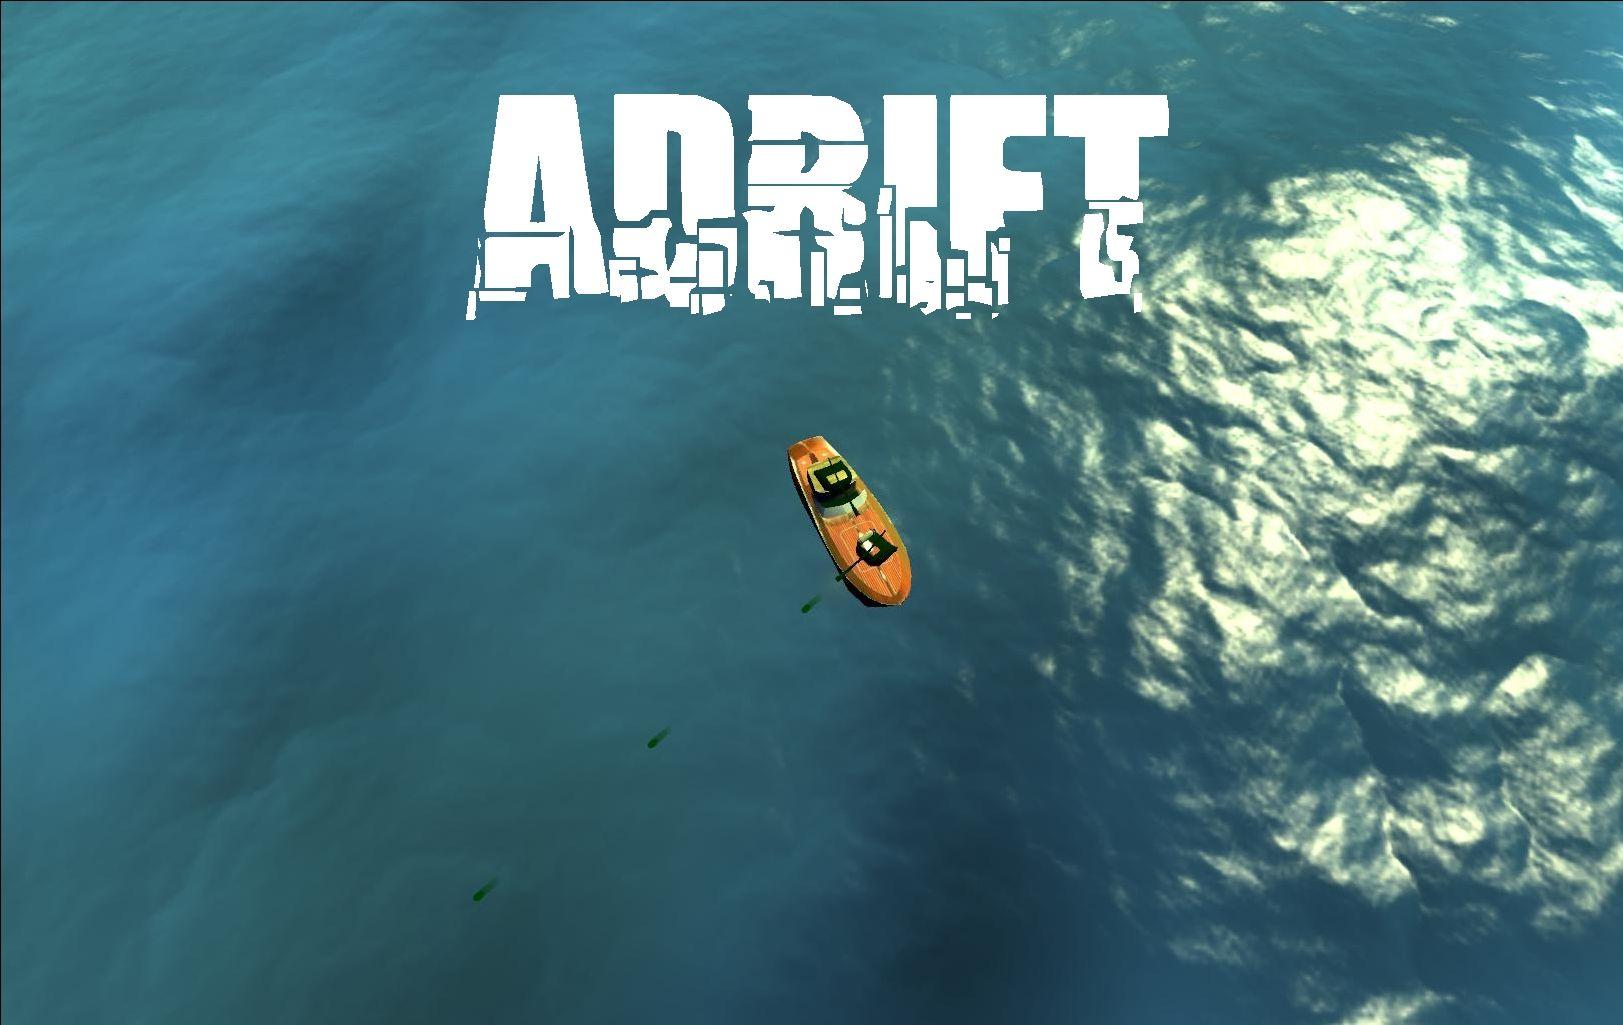 3d Action Game Wallpaper Wallpaper Image Adrift Mod Db